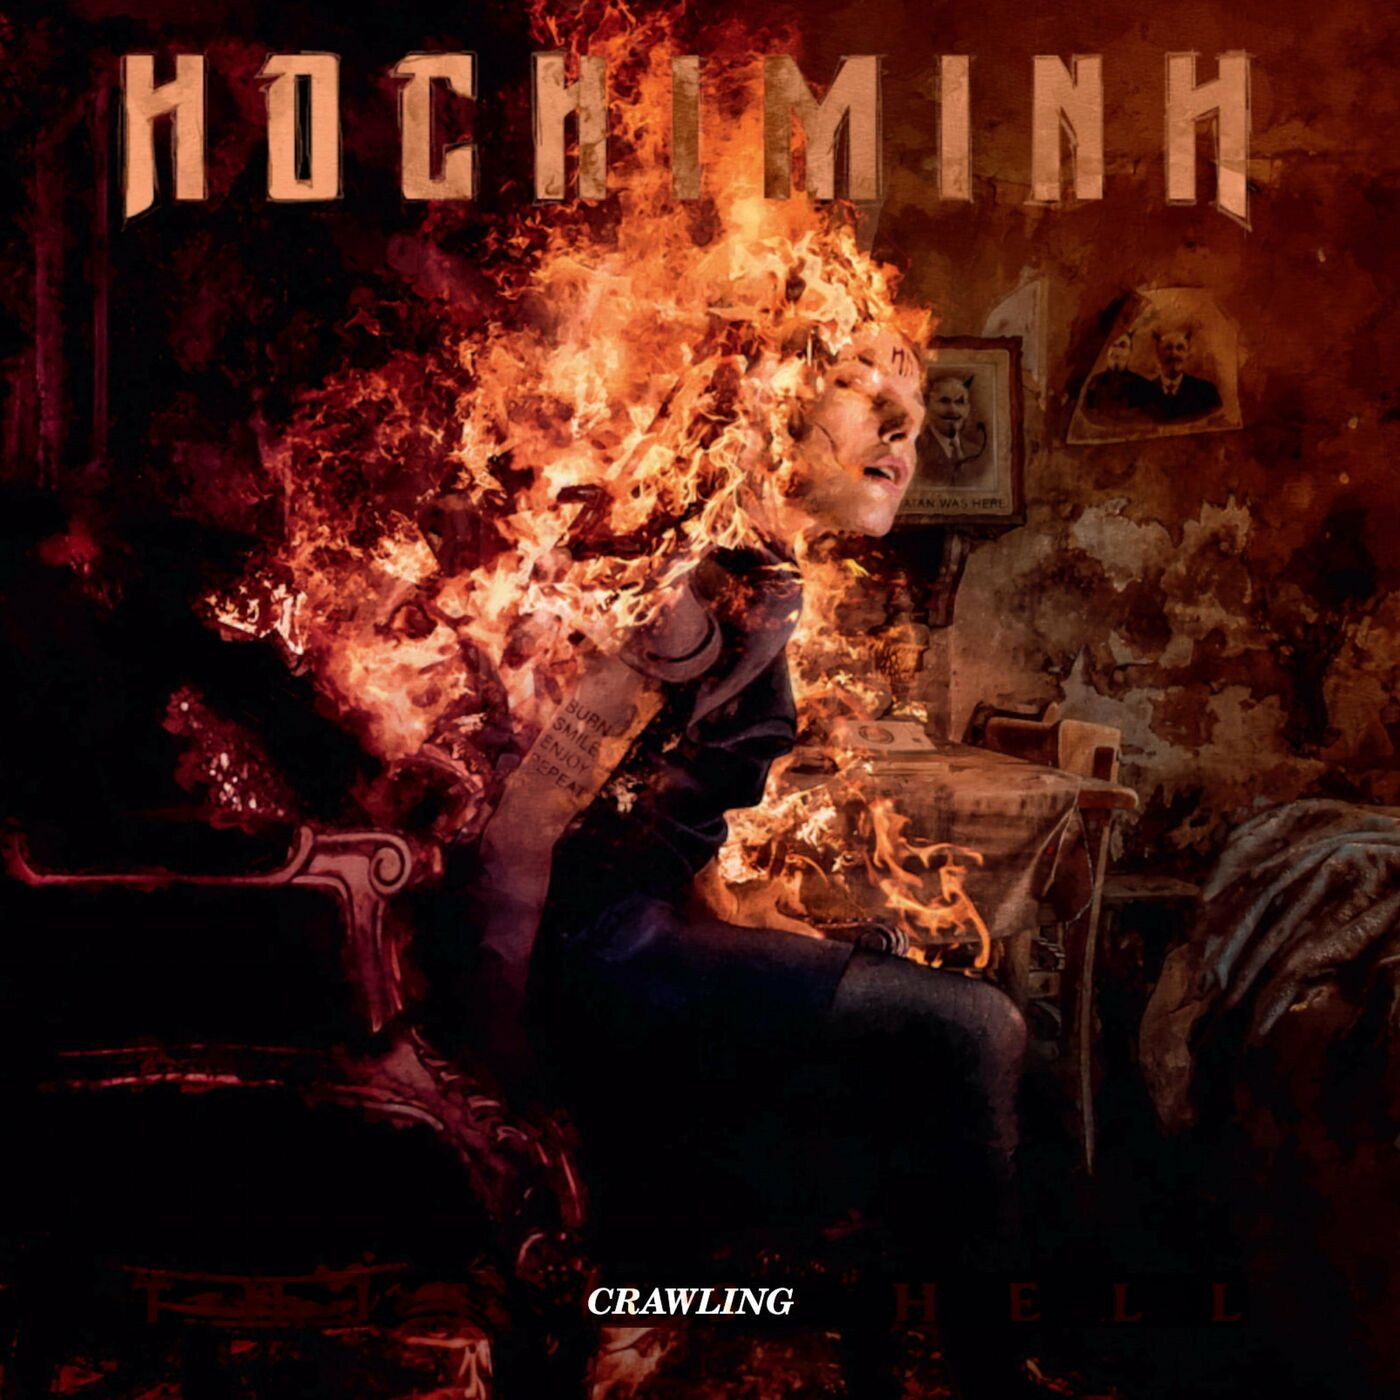 Hochiminh - Crawling [single] (2021)